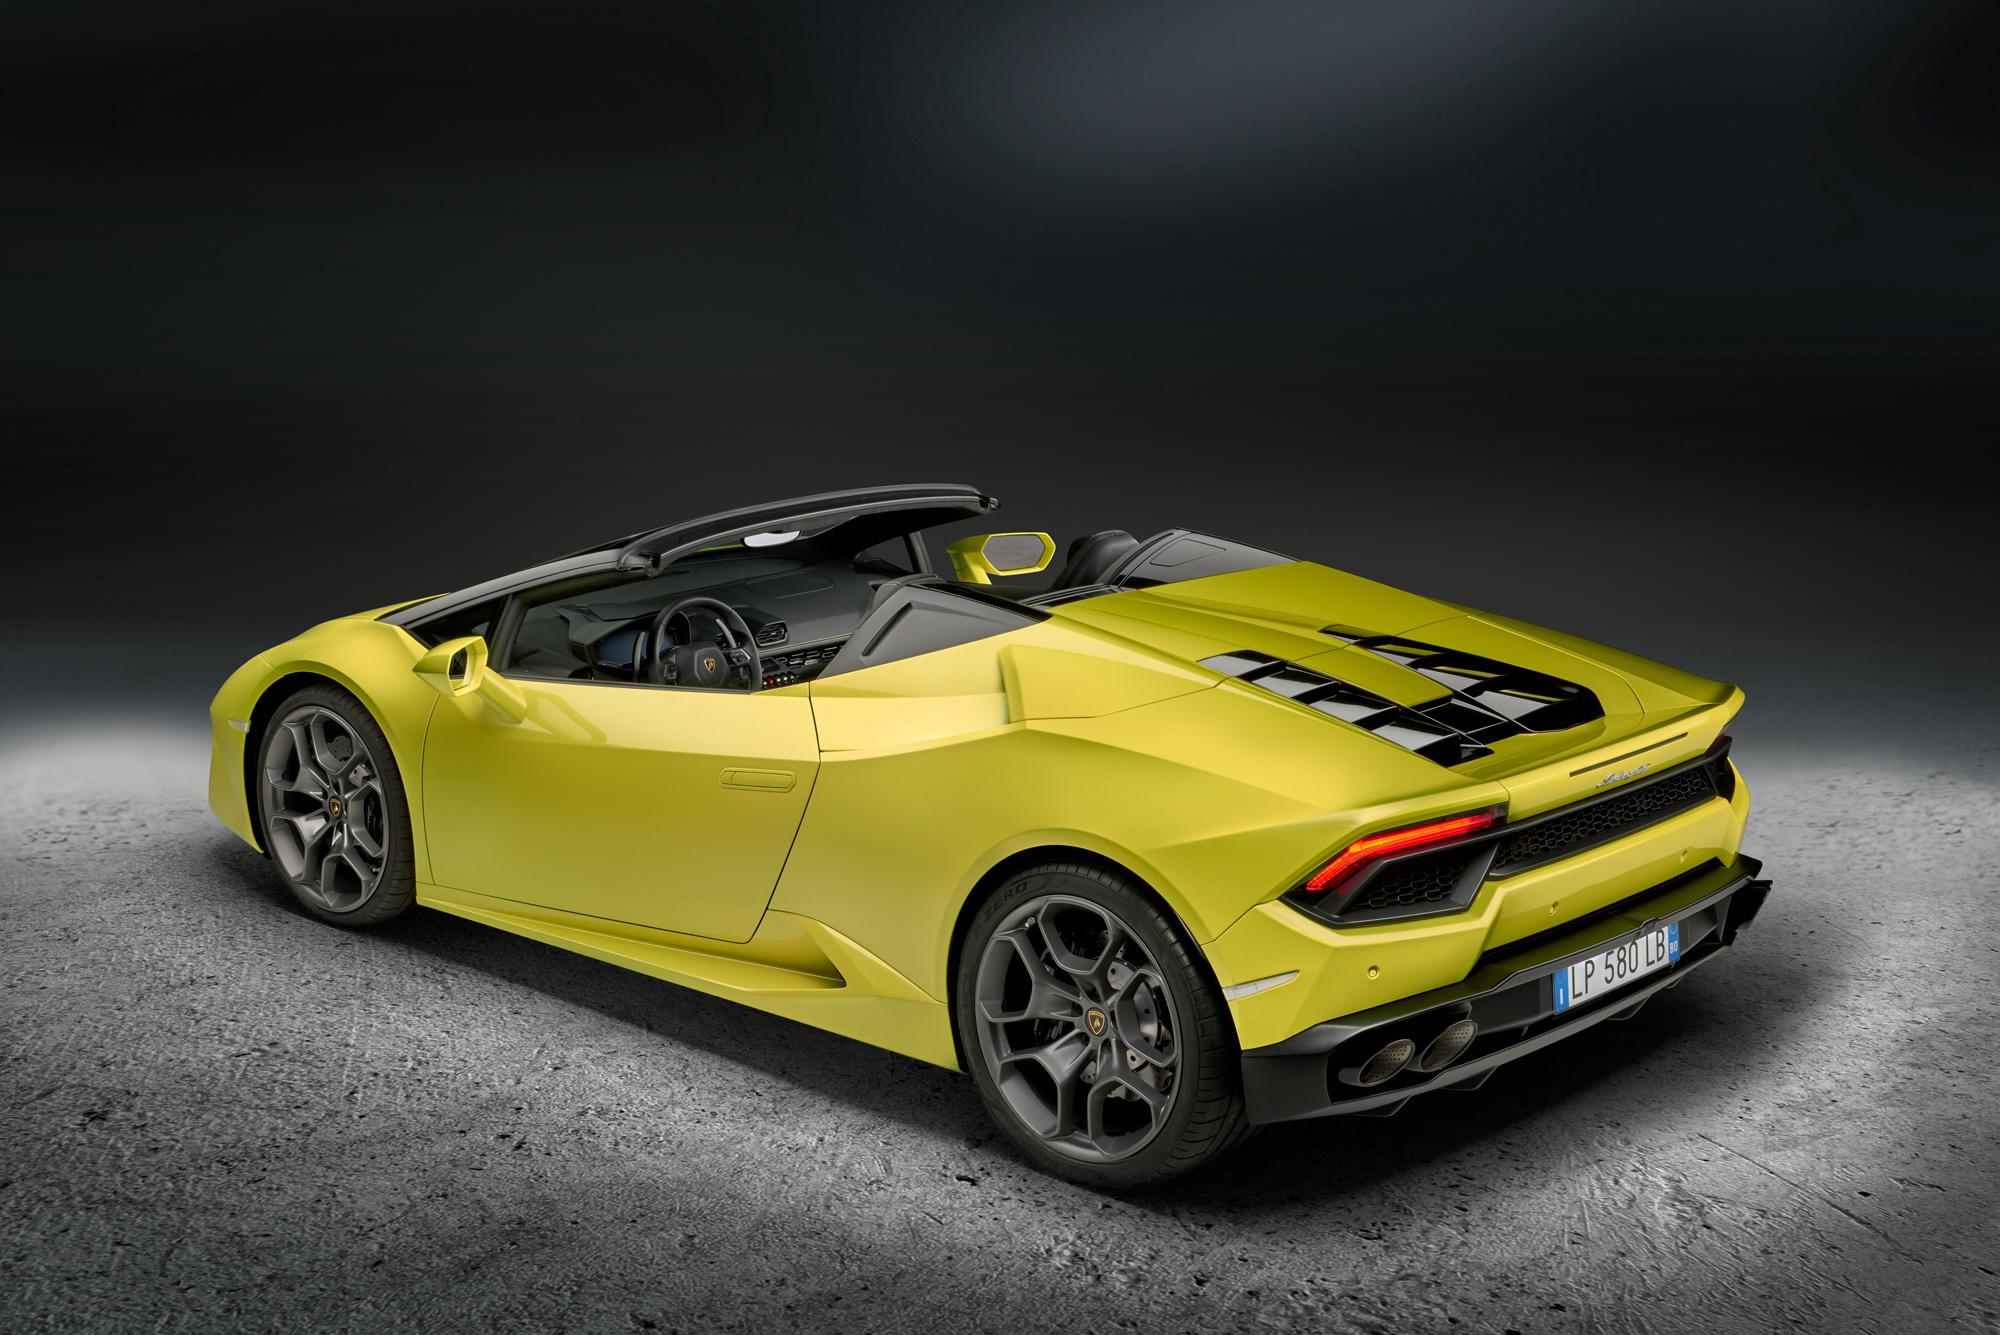 Lamborghini Huracan Rwd Spyder Photos